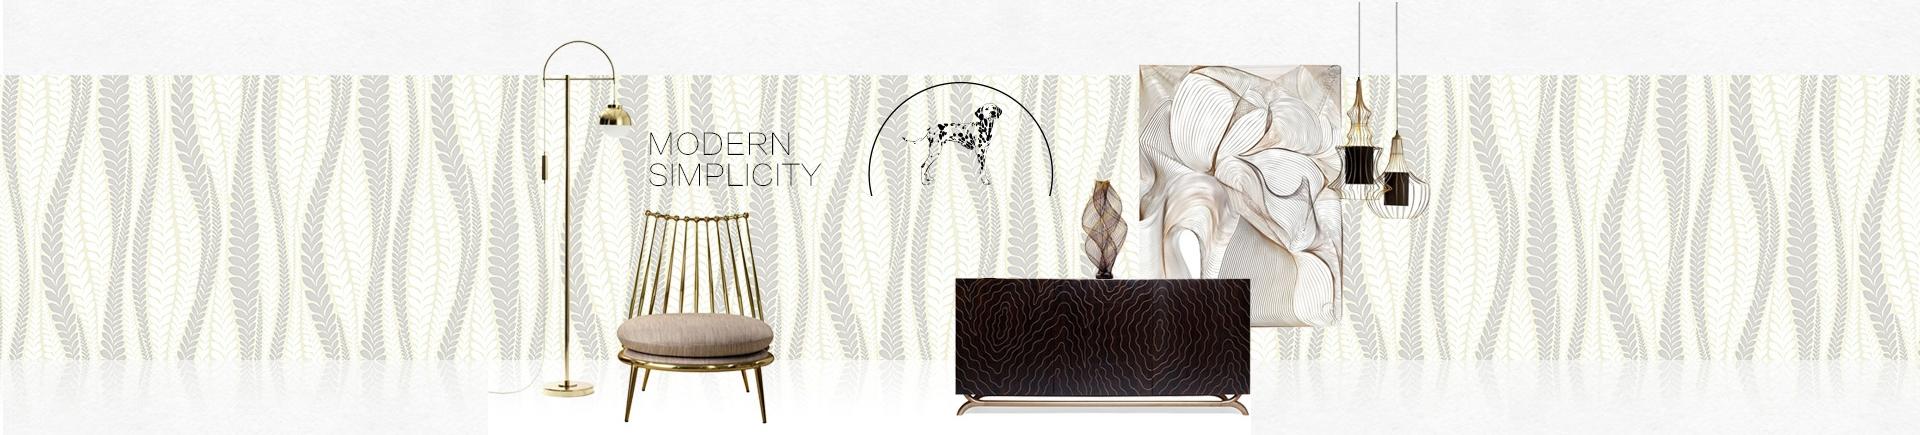 Wallpaper wallcovering designer wallpaper mesu for Designer wallpaper brands